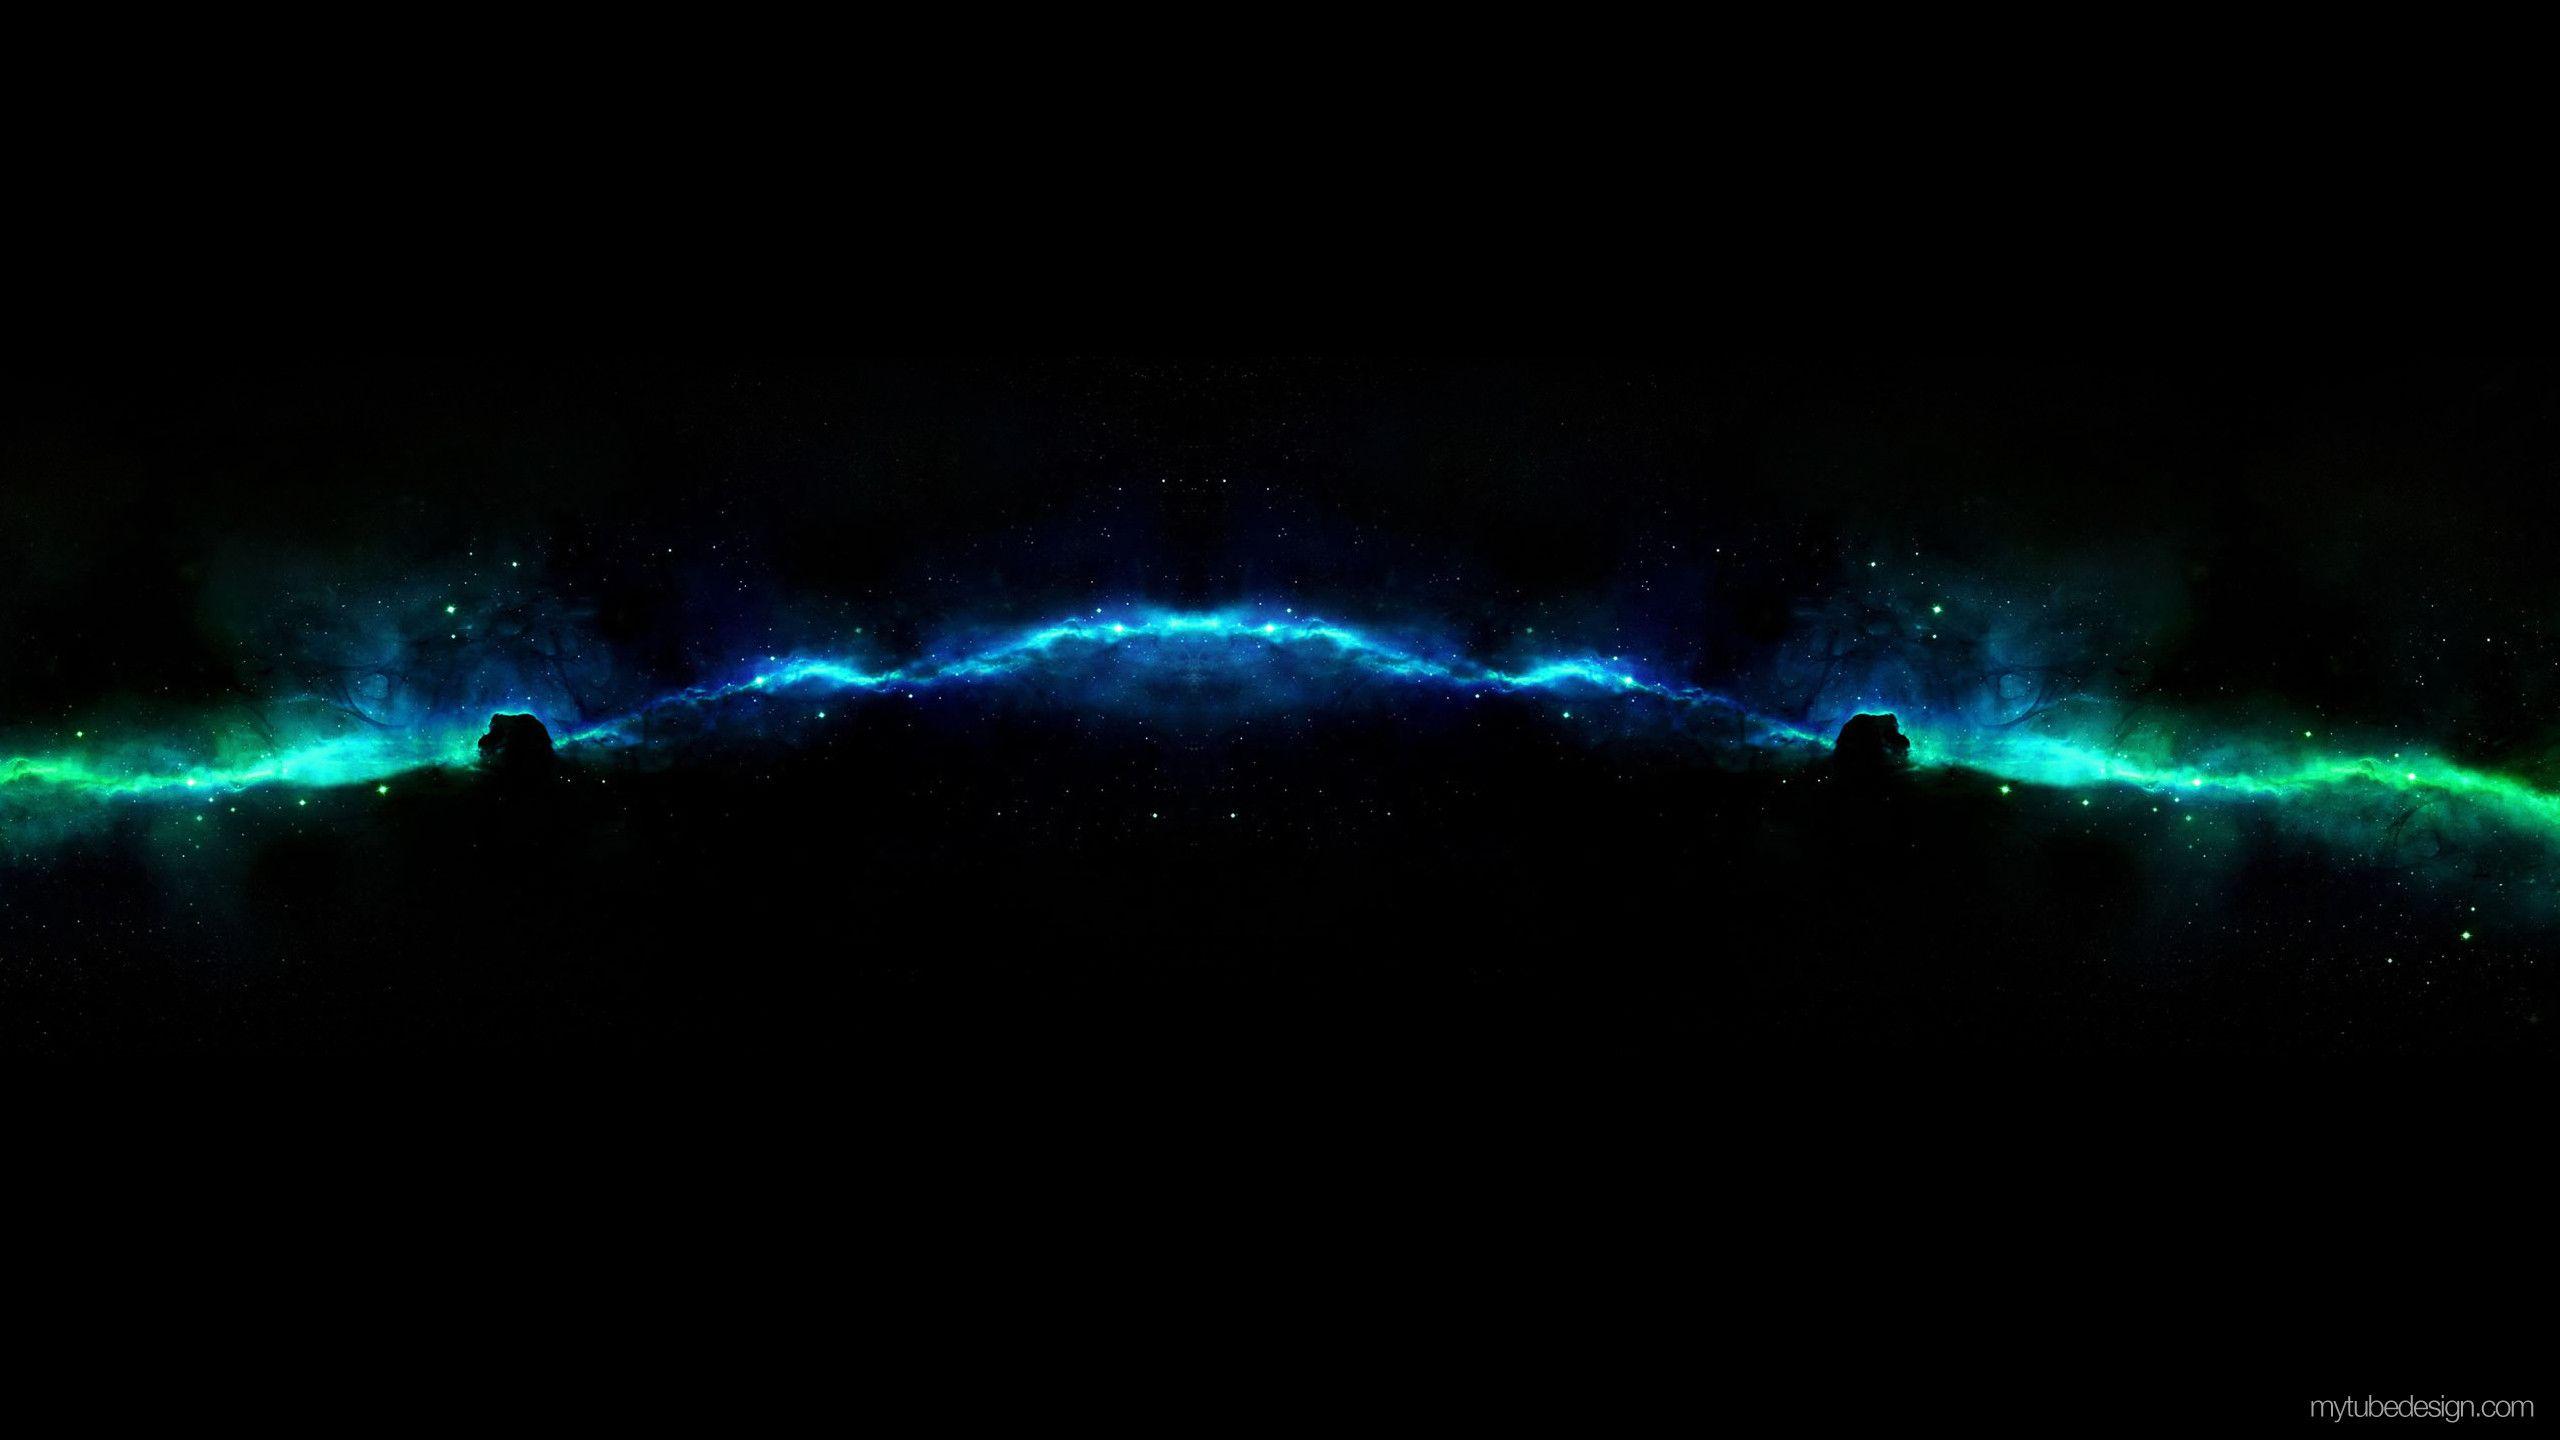 2048x1152 Wallpaper For Youtube Channel Fortnite